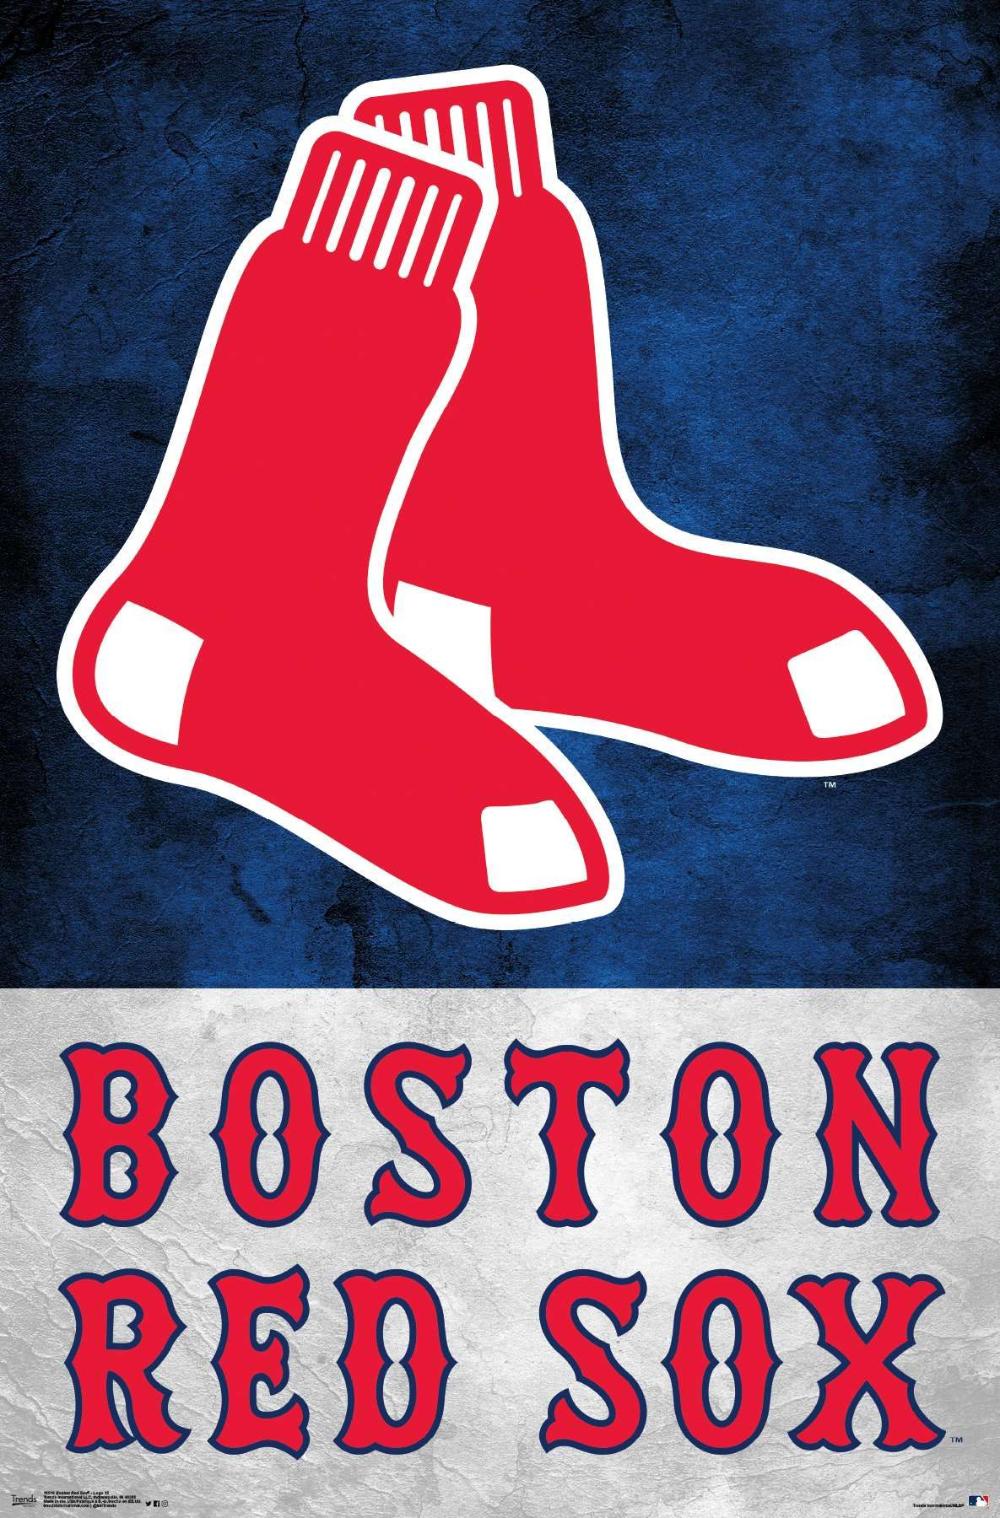 Mlb Boston Red Sox Logo Boston Red Sox Logo Boston Red Sox Poster Red Sox Logo